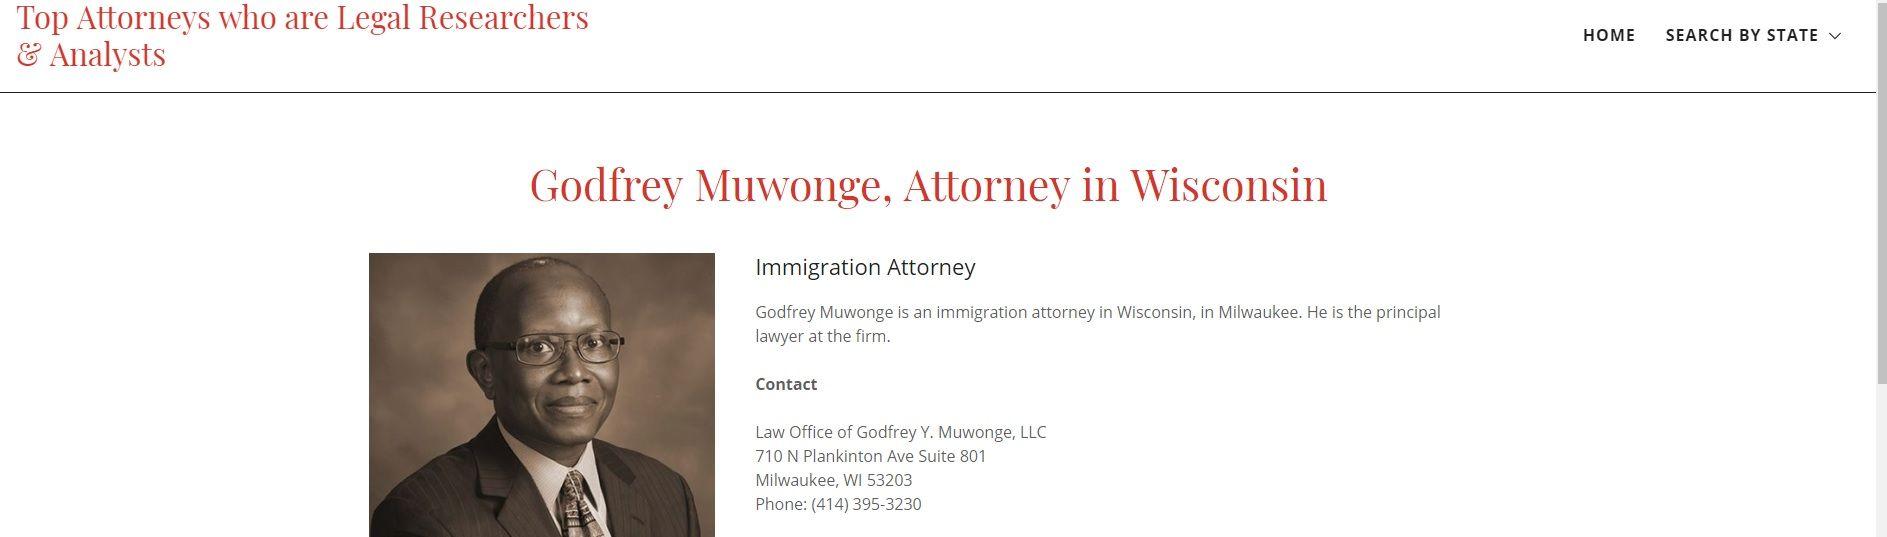 Law Office of Godfrey Y. Muwonge, LLC Logo